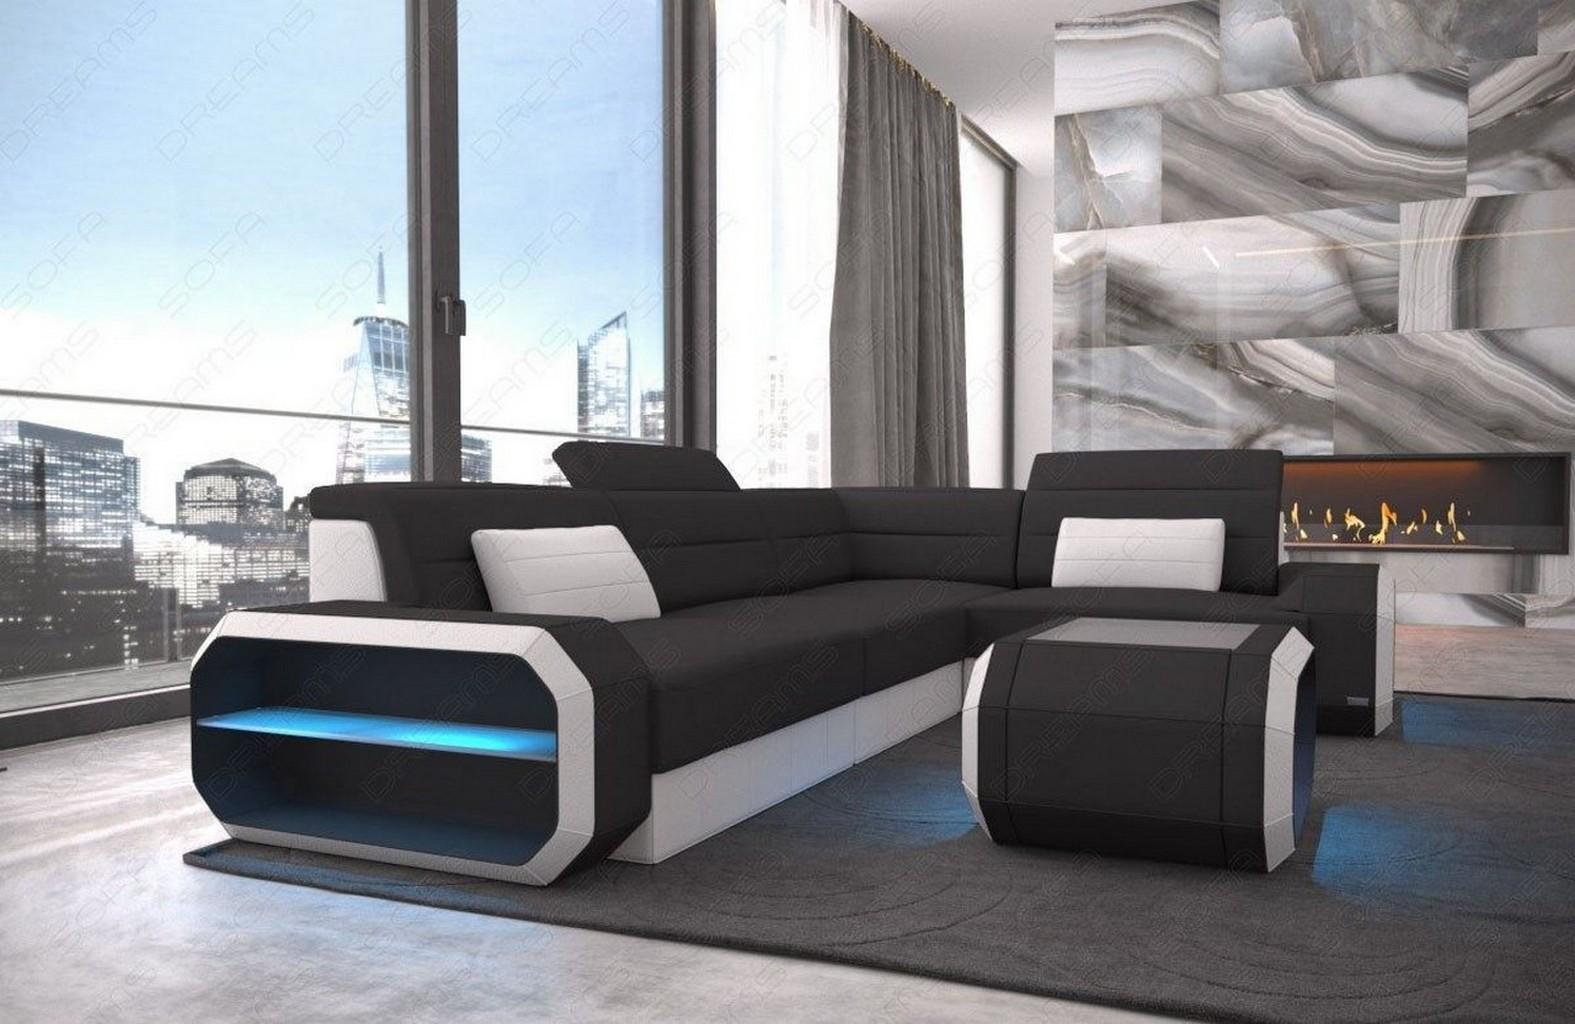 Luxus design ecksofa stoff couch verona l form ottomane for Design couchtisch fabric